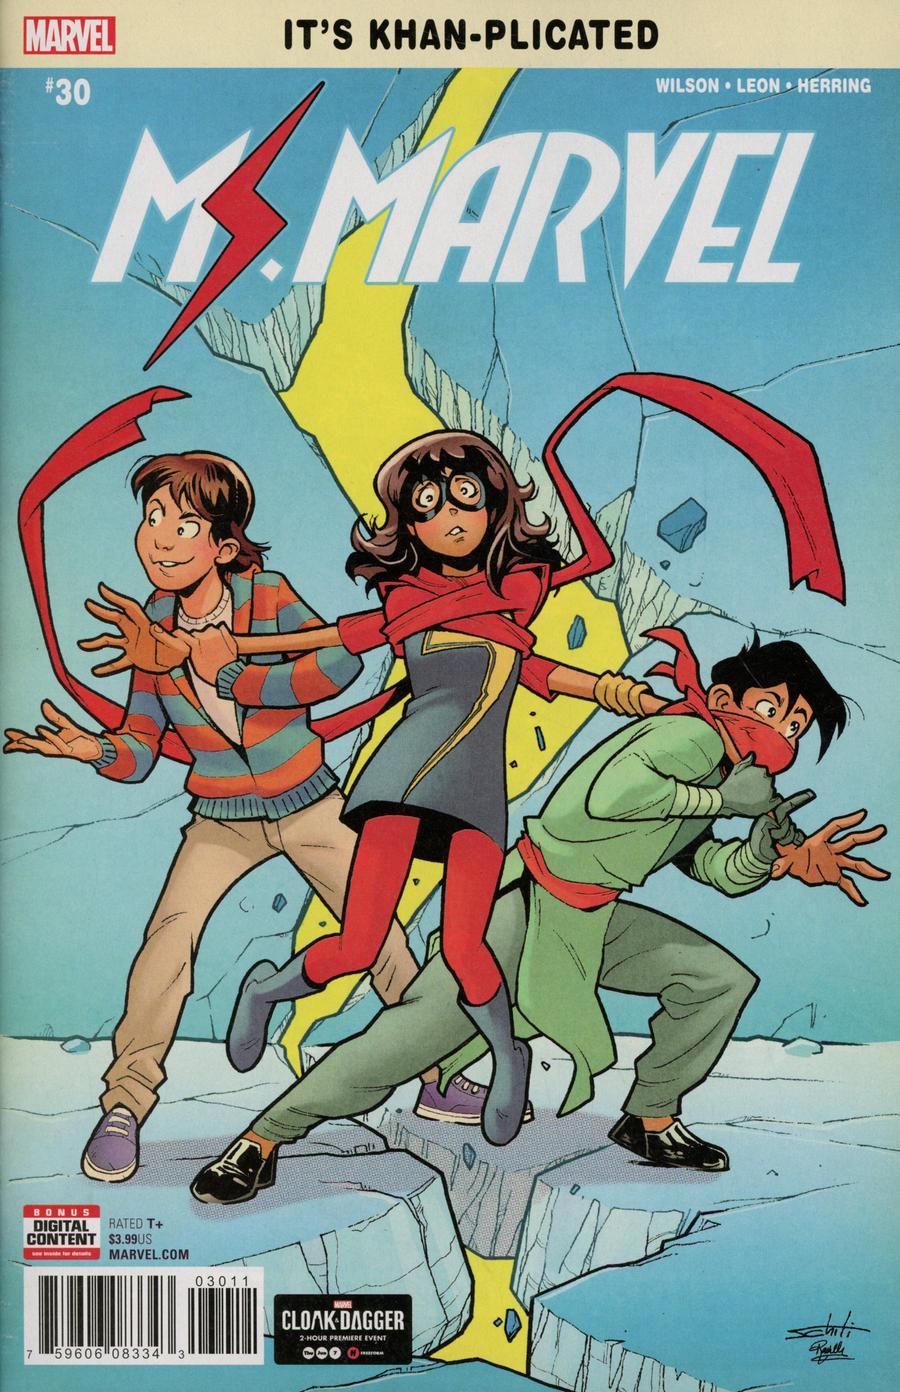 Ms Marvel Vol 4 #30